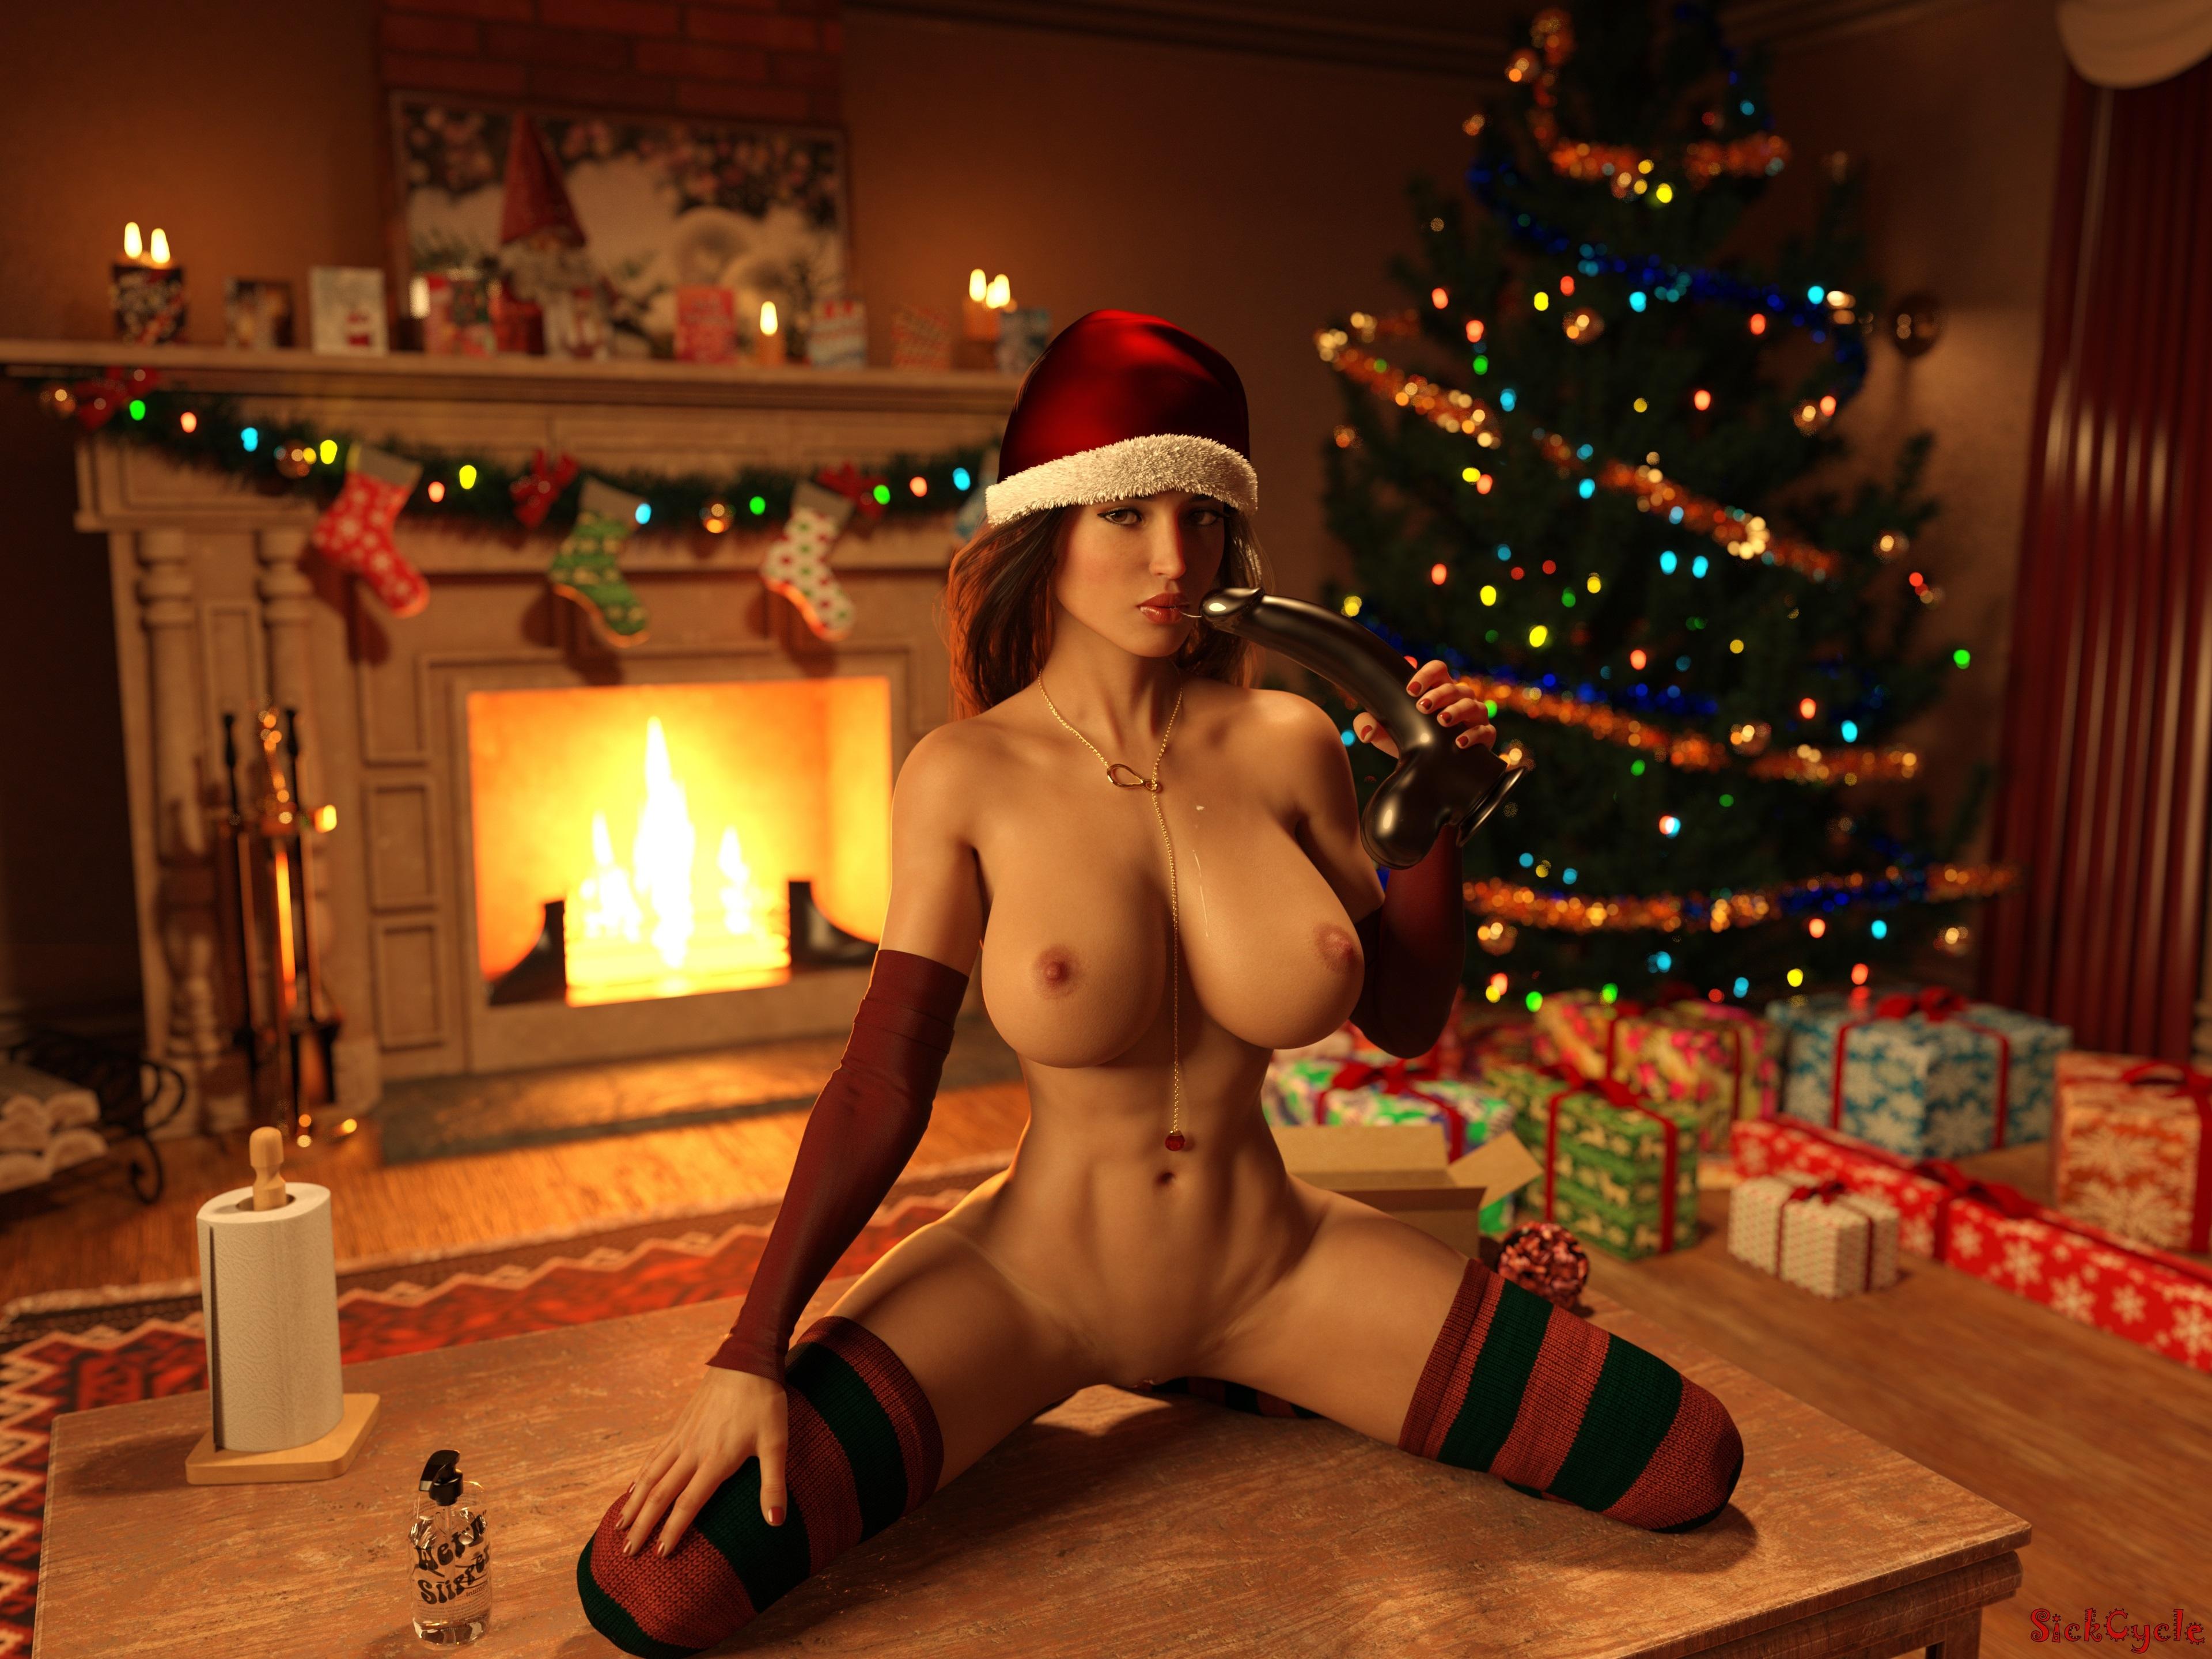 Lara Croft XMAS gift by SickCycle